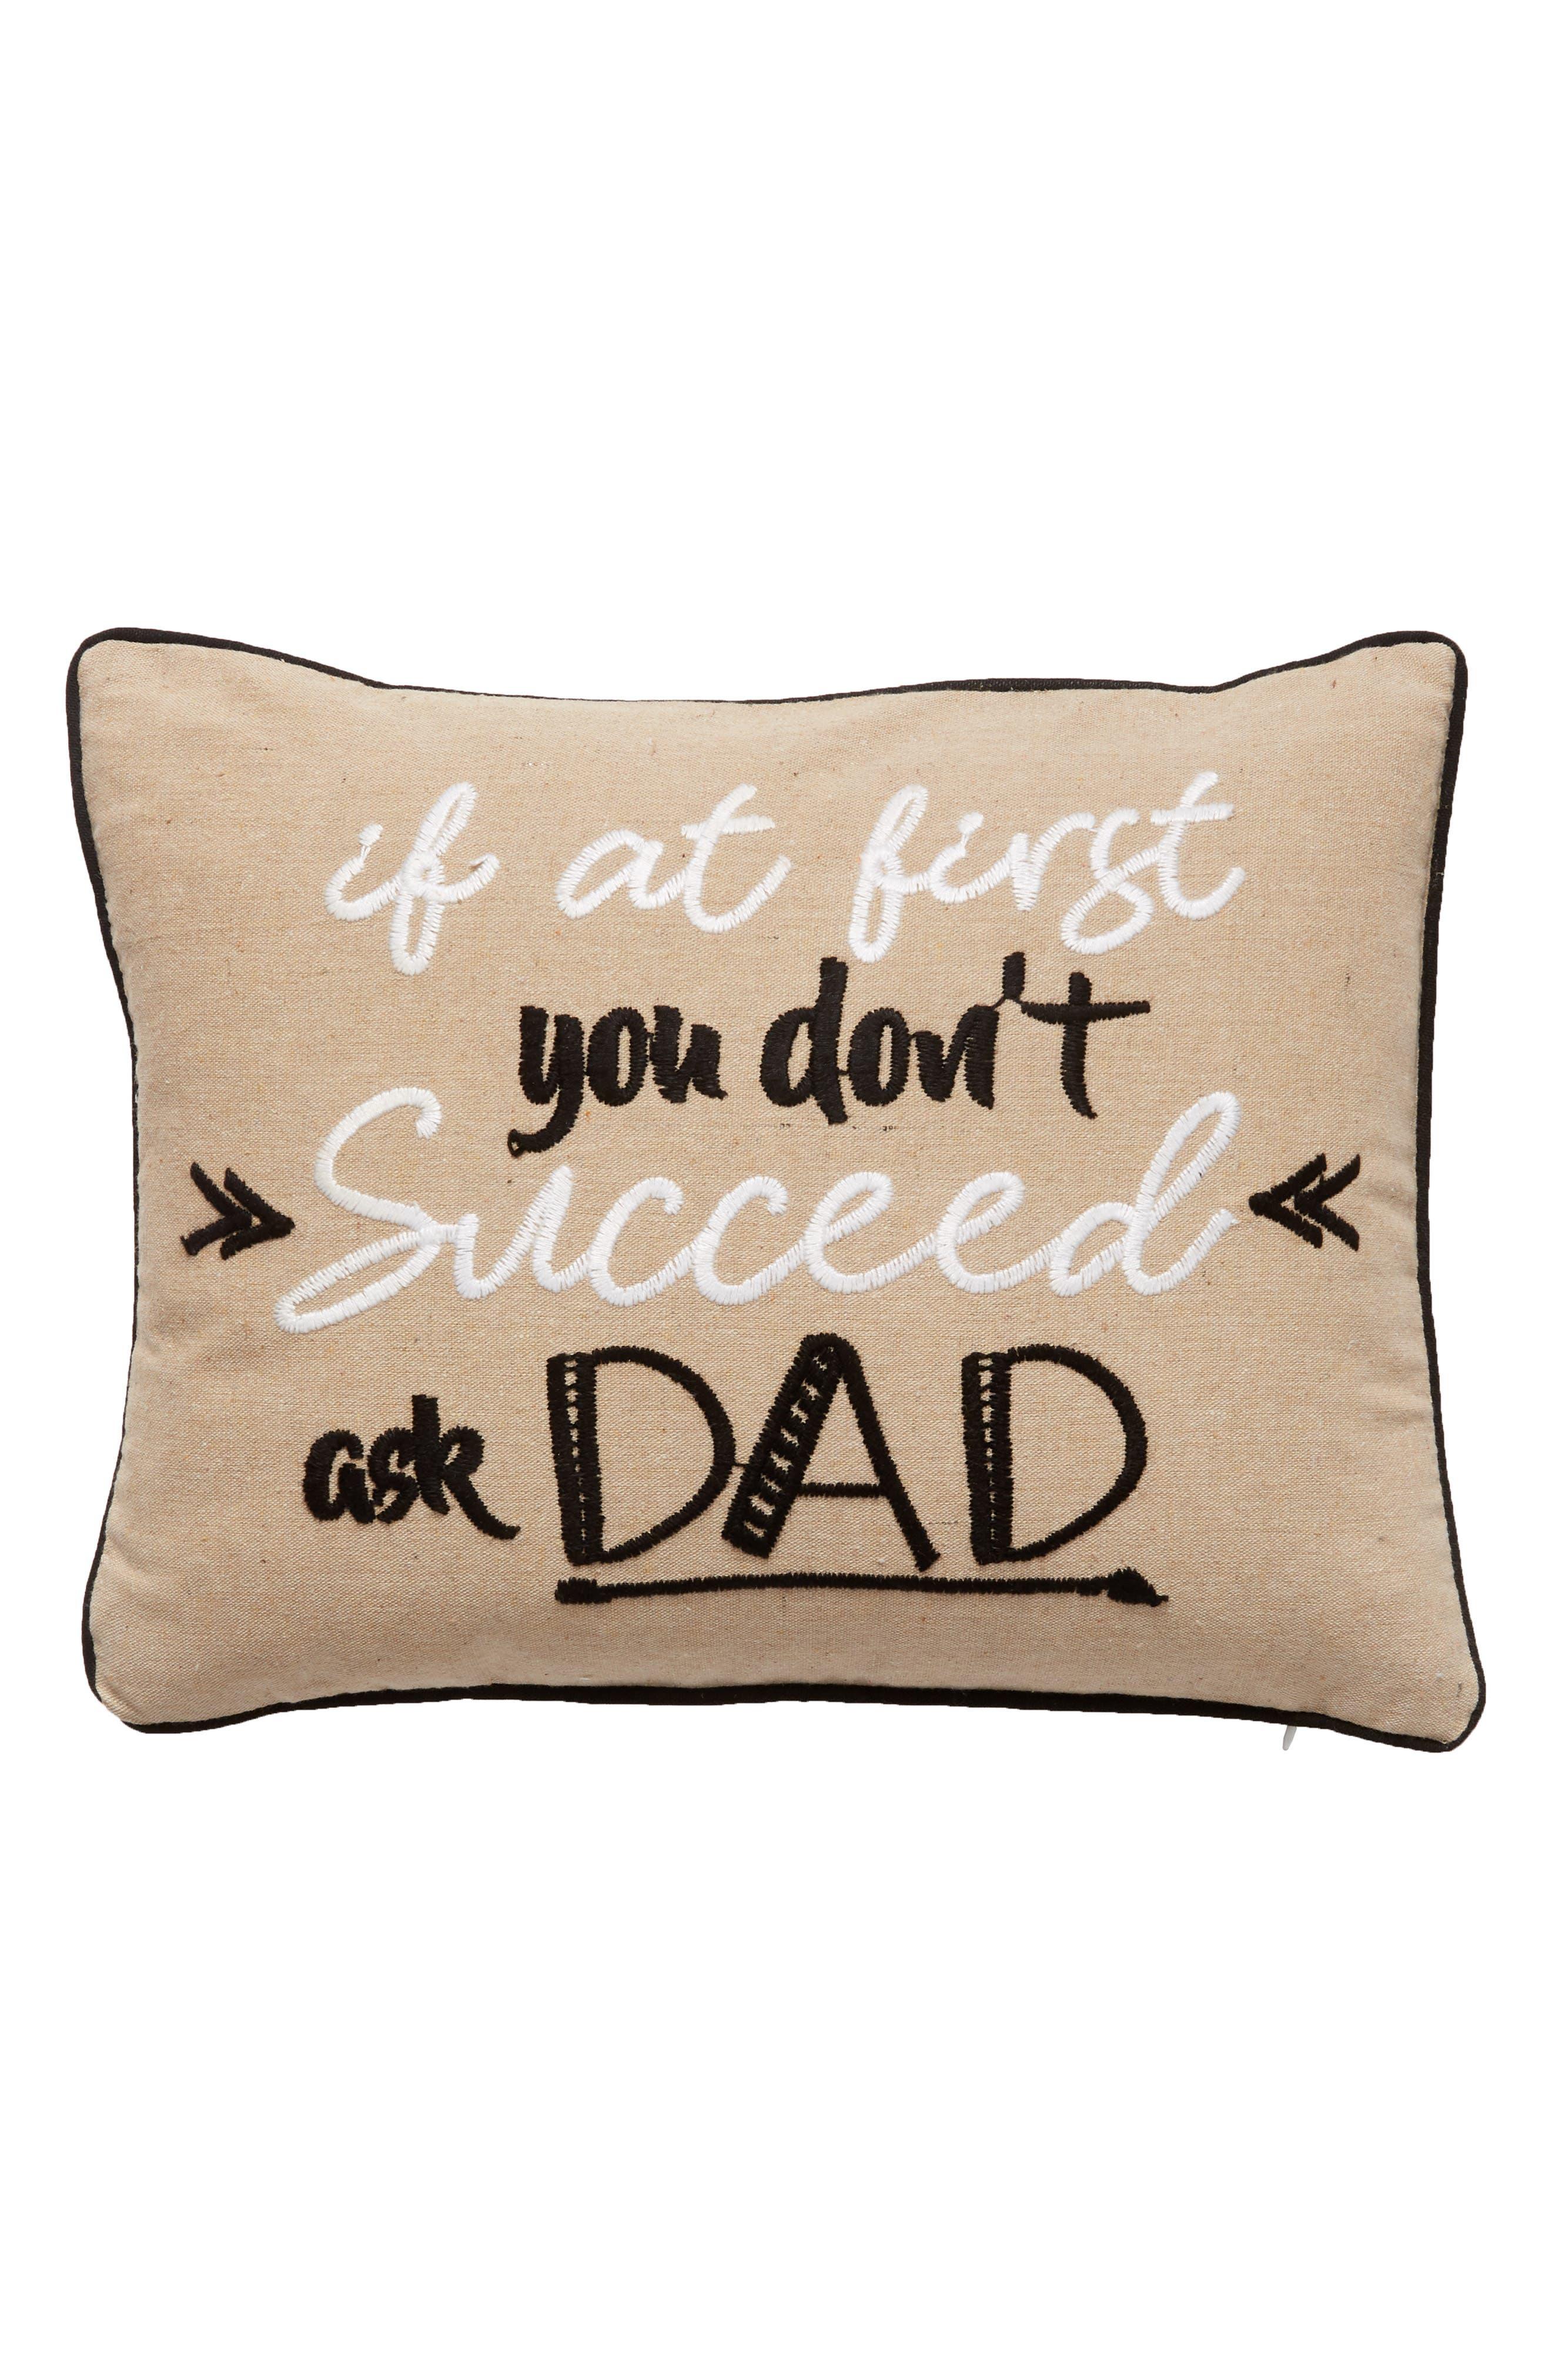 Ask Dad Accent Pillow,                             Main thumbnail 1, color,                             250